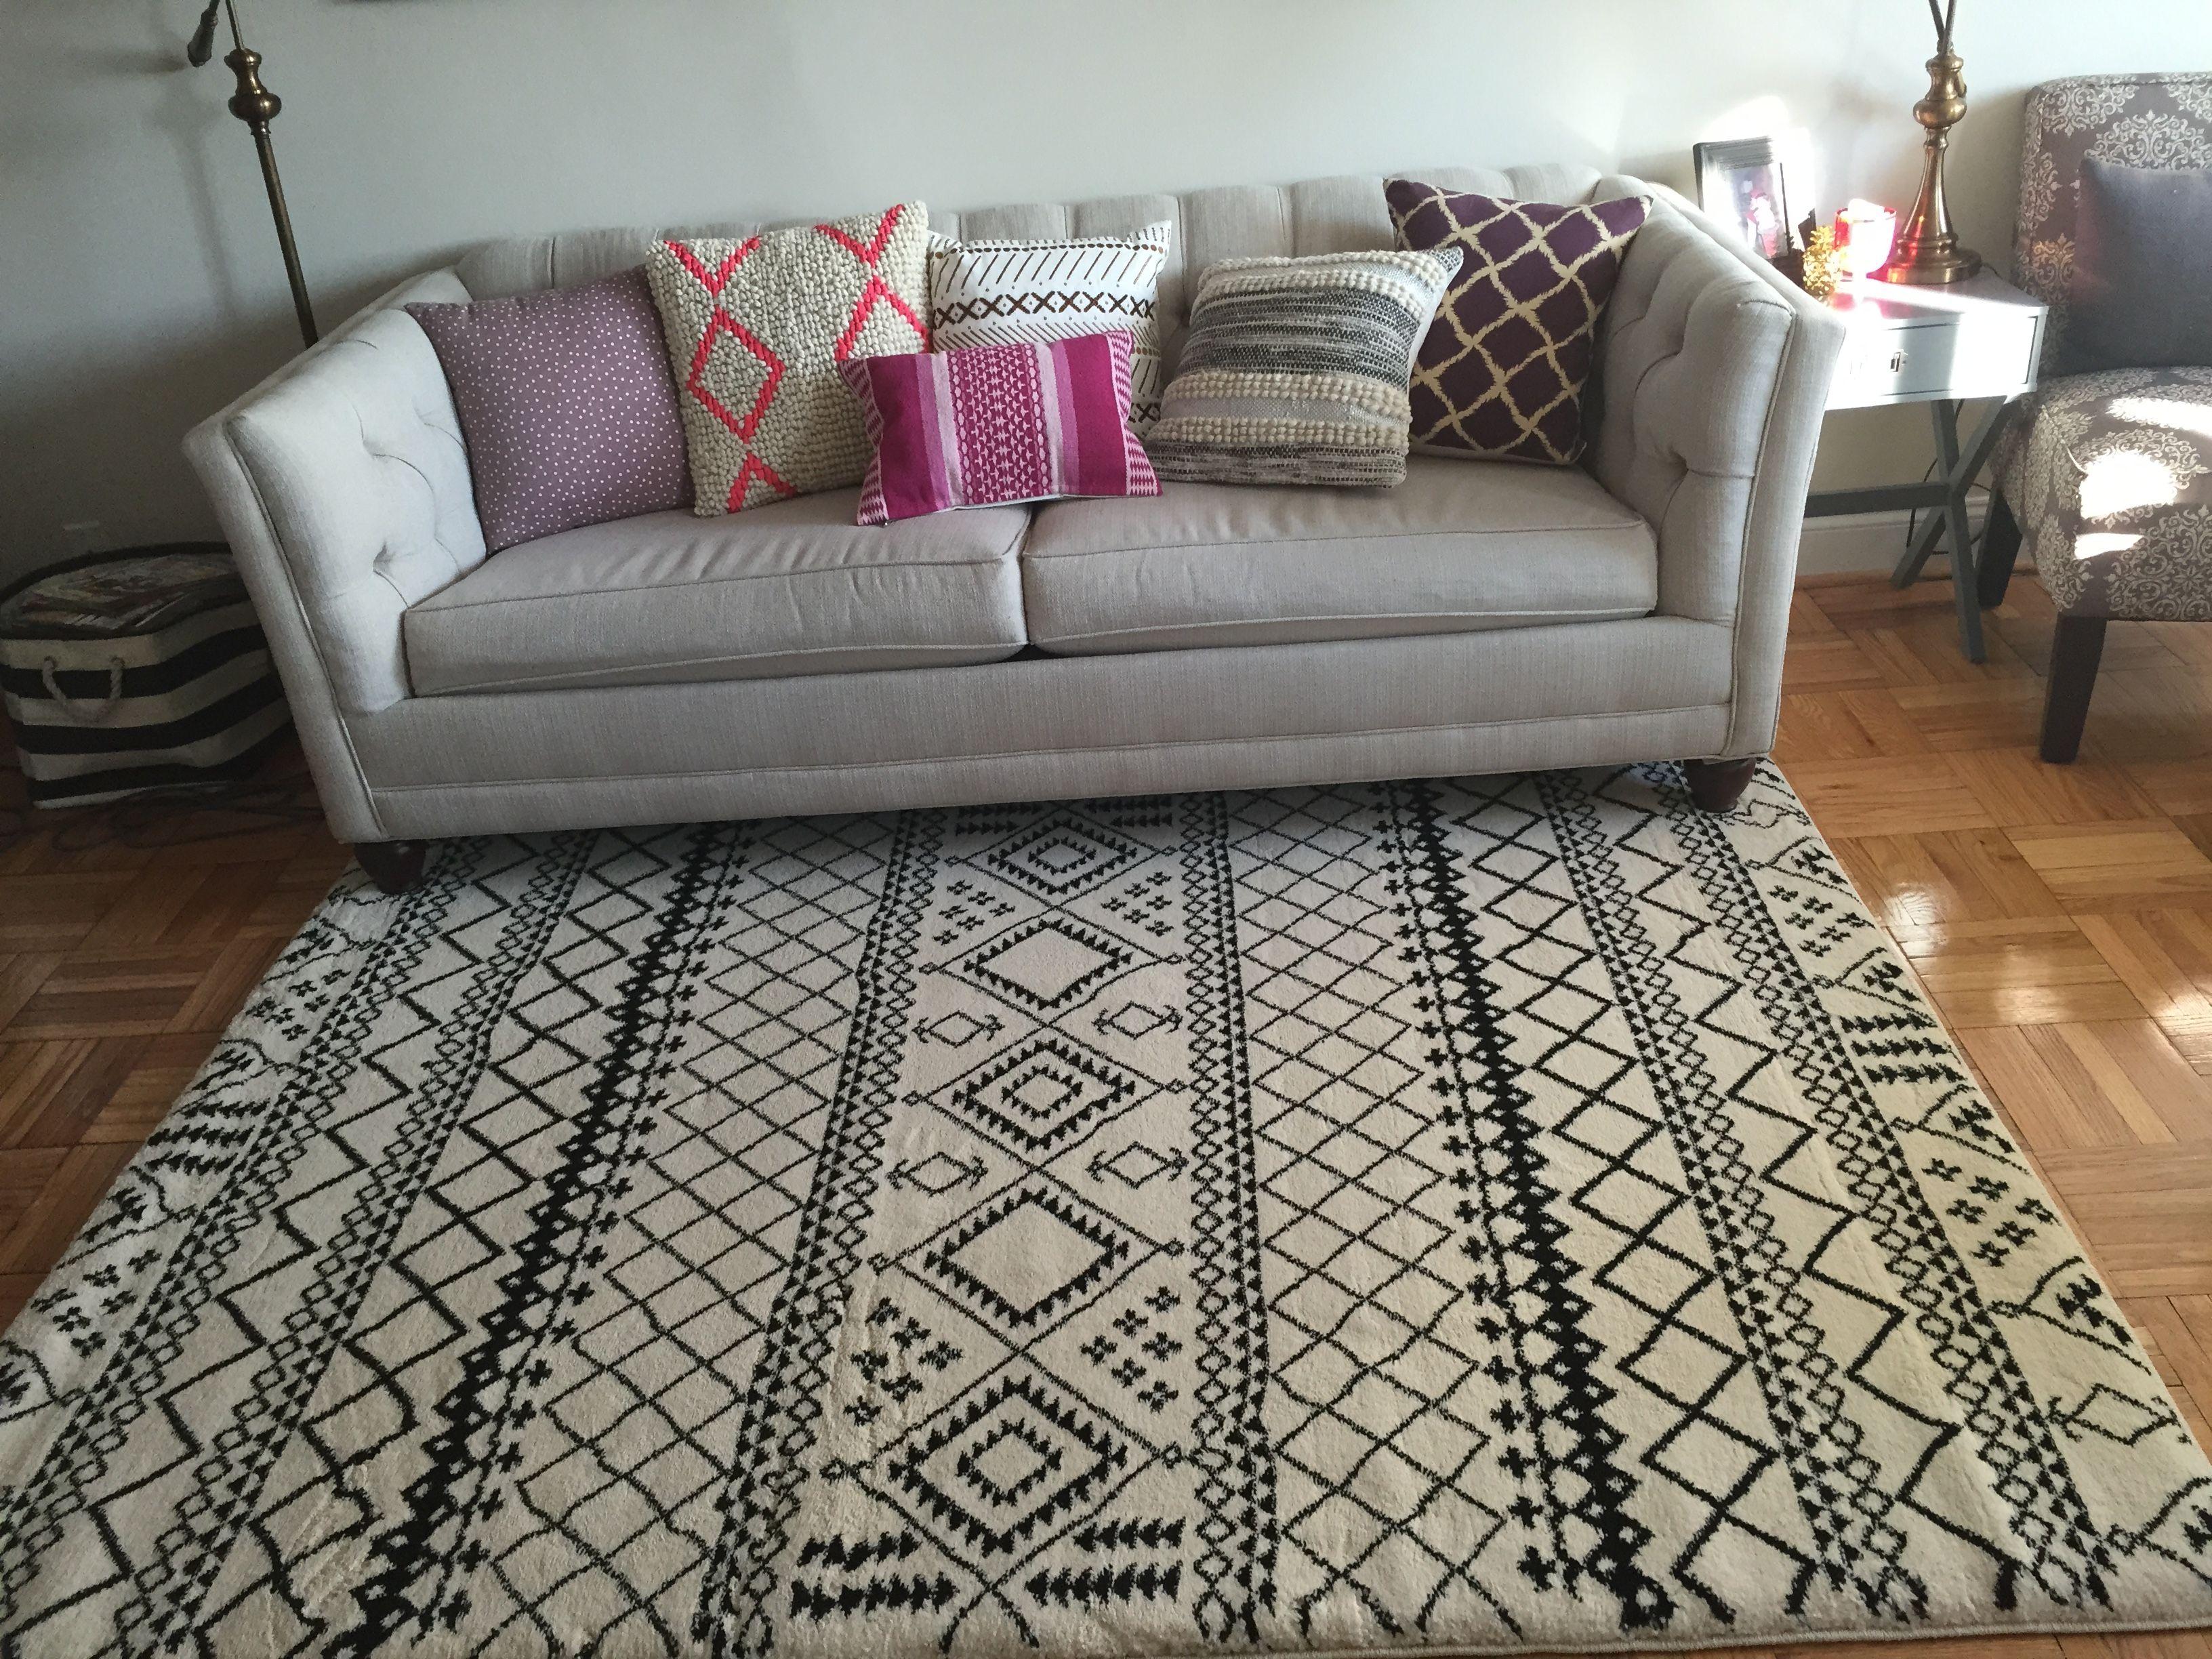 Elegant Area Rugs Target For Inspiring Indoor And Outdoor Floor Decor Ideas Enchanting Aztec With Gray Loveseat Decorative